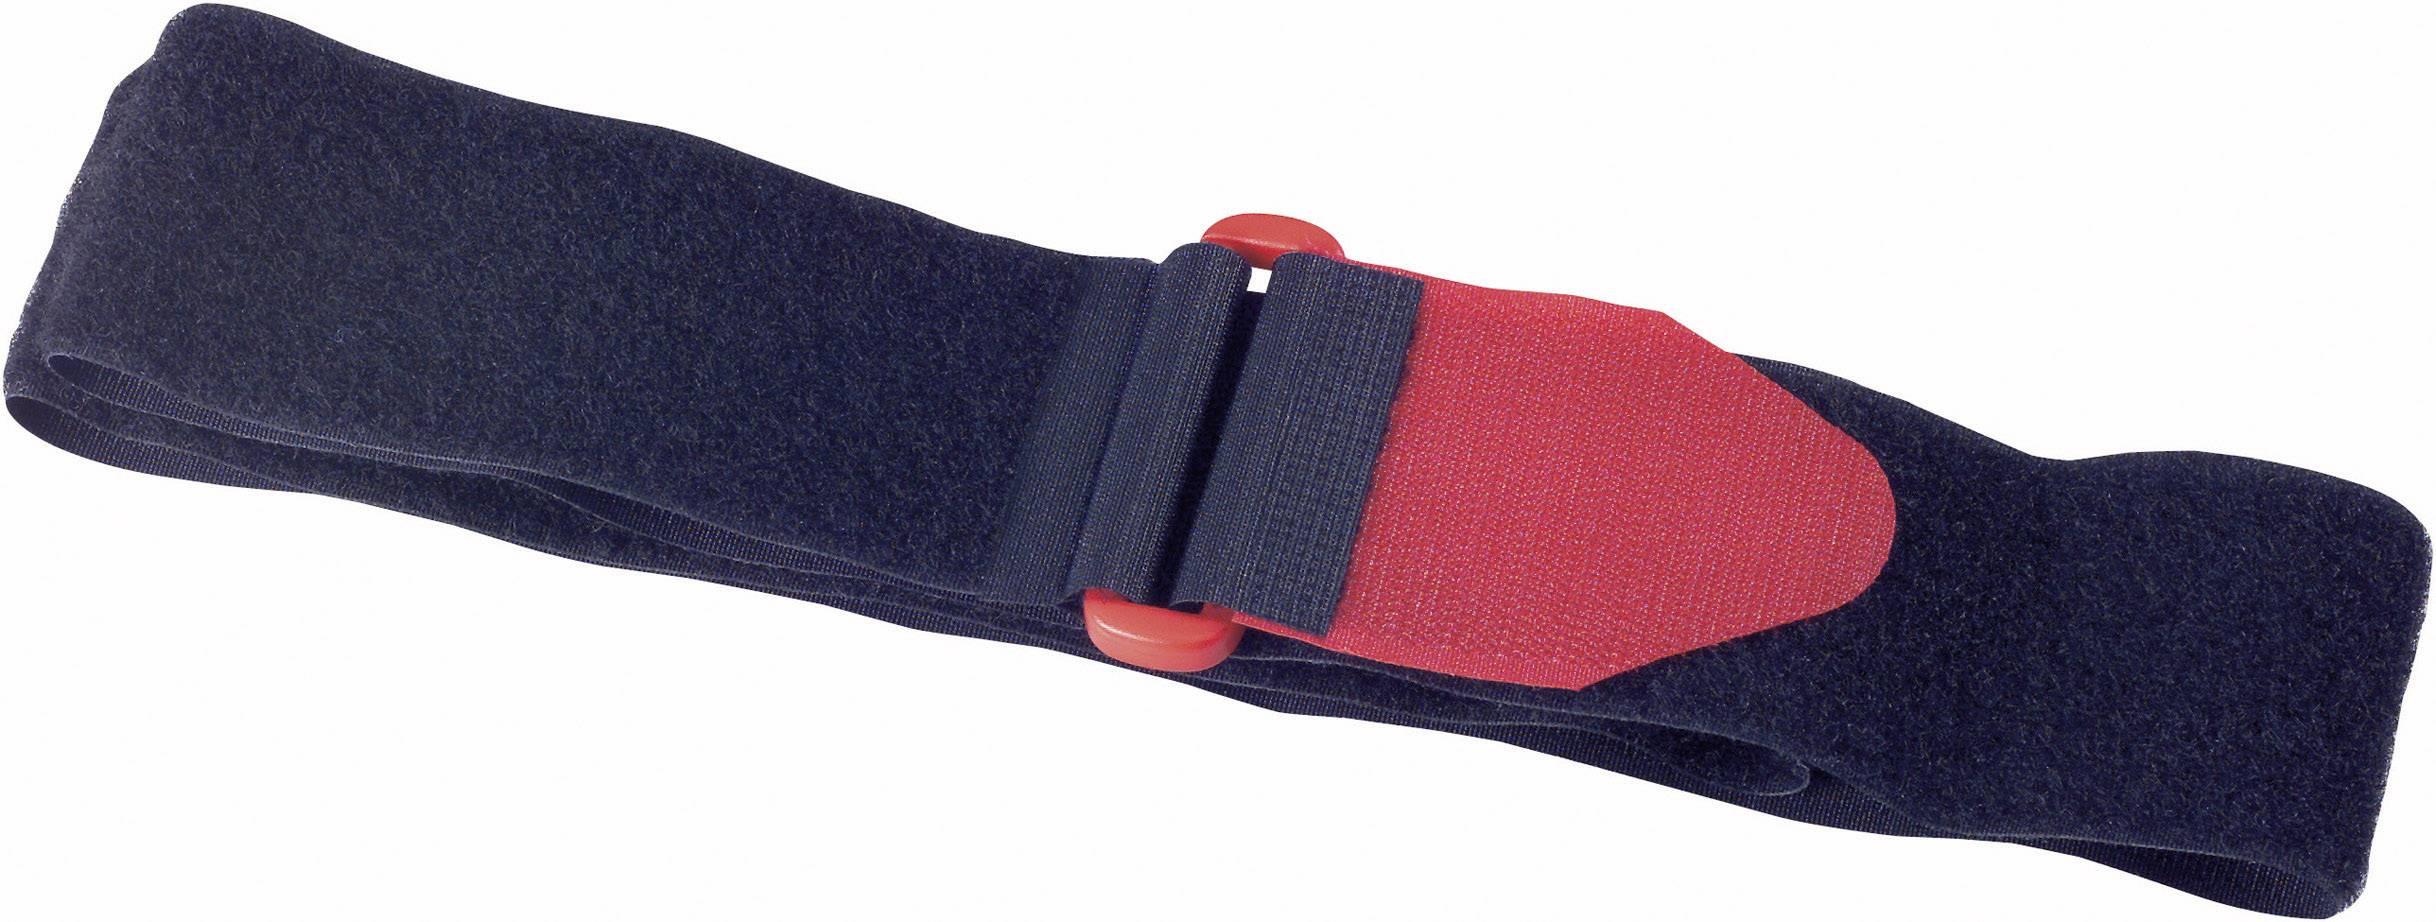 Pásik so suchým zipsom Fastech 687-330, (d x š) 350 mm x 20 mm, čierna, červená, 2 ks